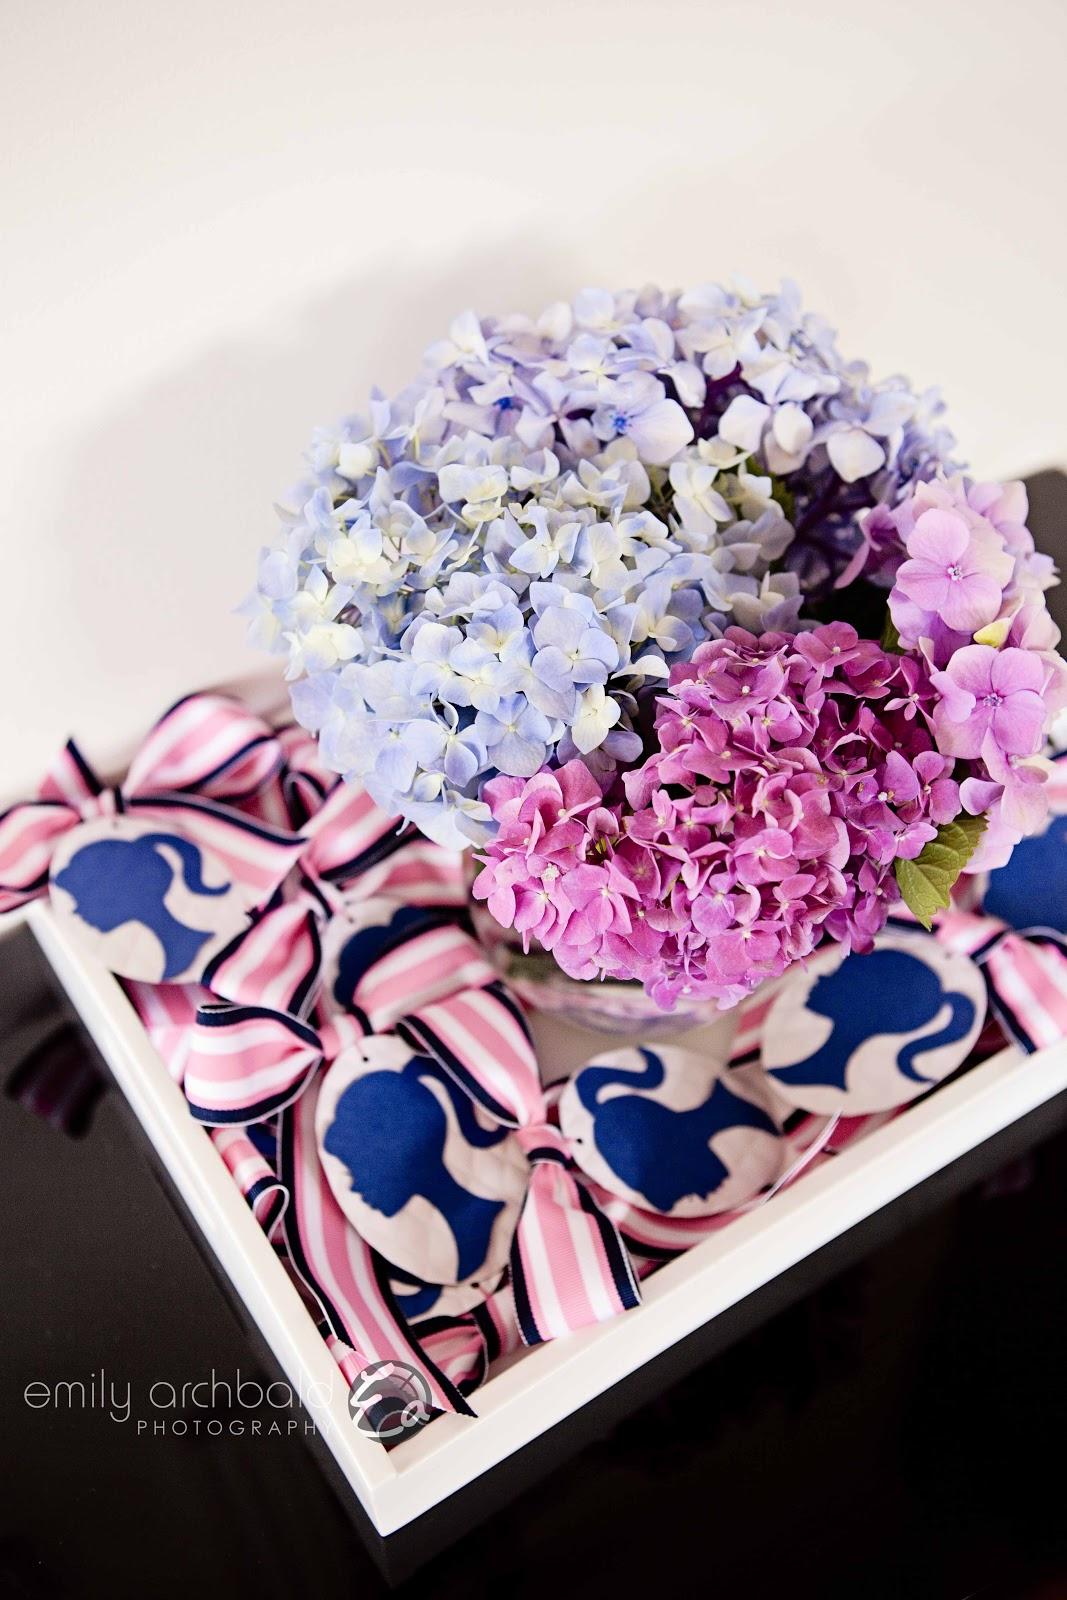 Kitchen Tea Party Lady Chatterleys Affair Blue White Pink Kitchen Tea